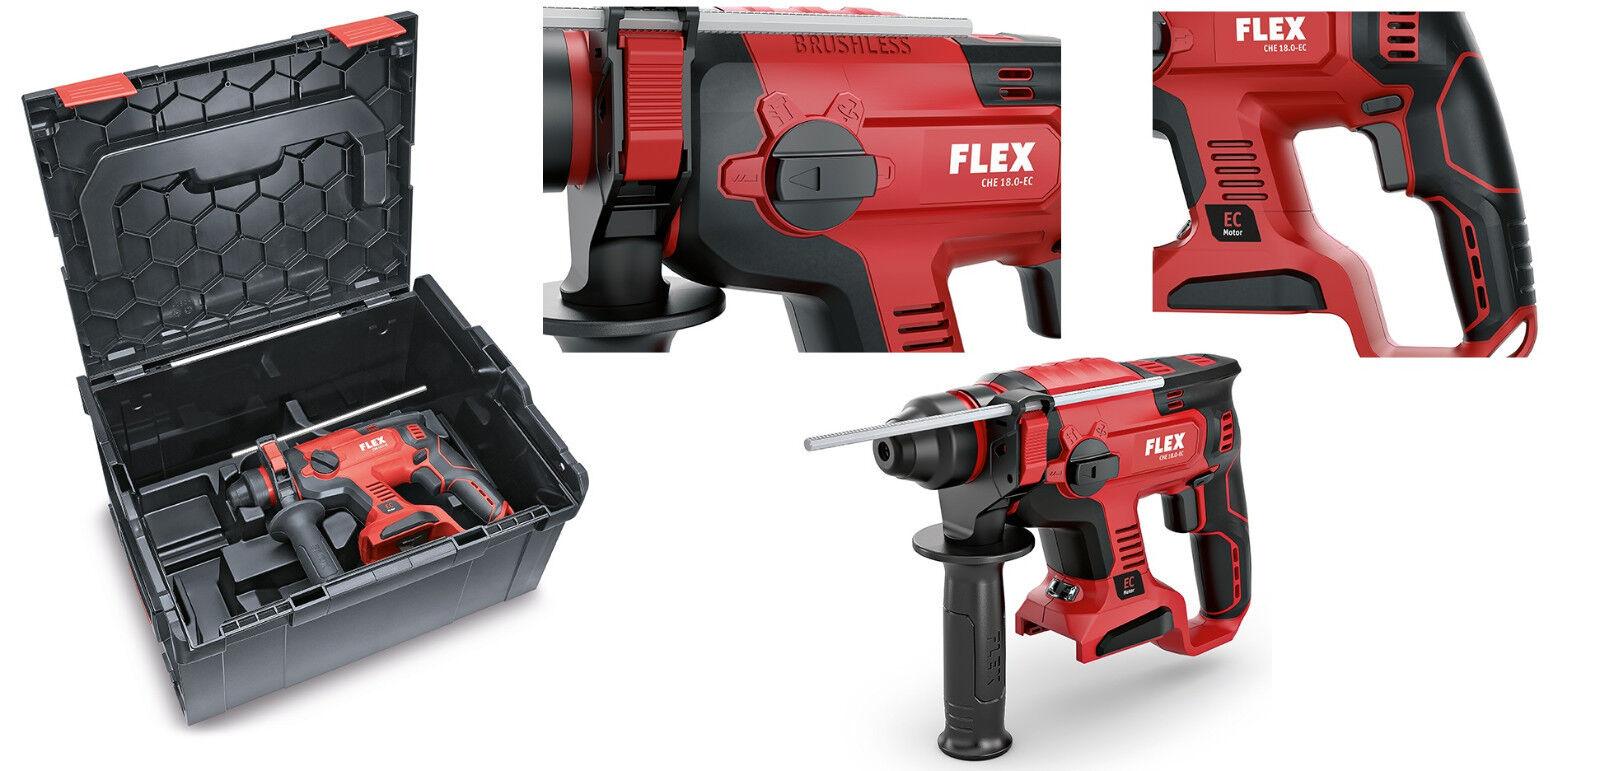 Flex Akku Kombi-Bohrhammer  CHE 18.0-EC +L-BOX  430.005